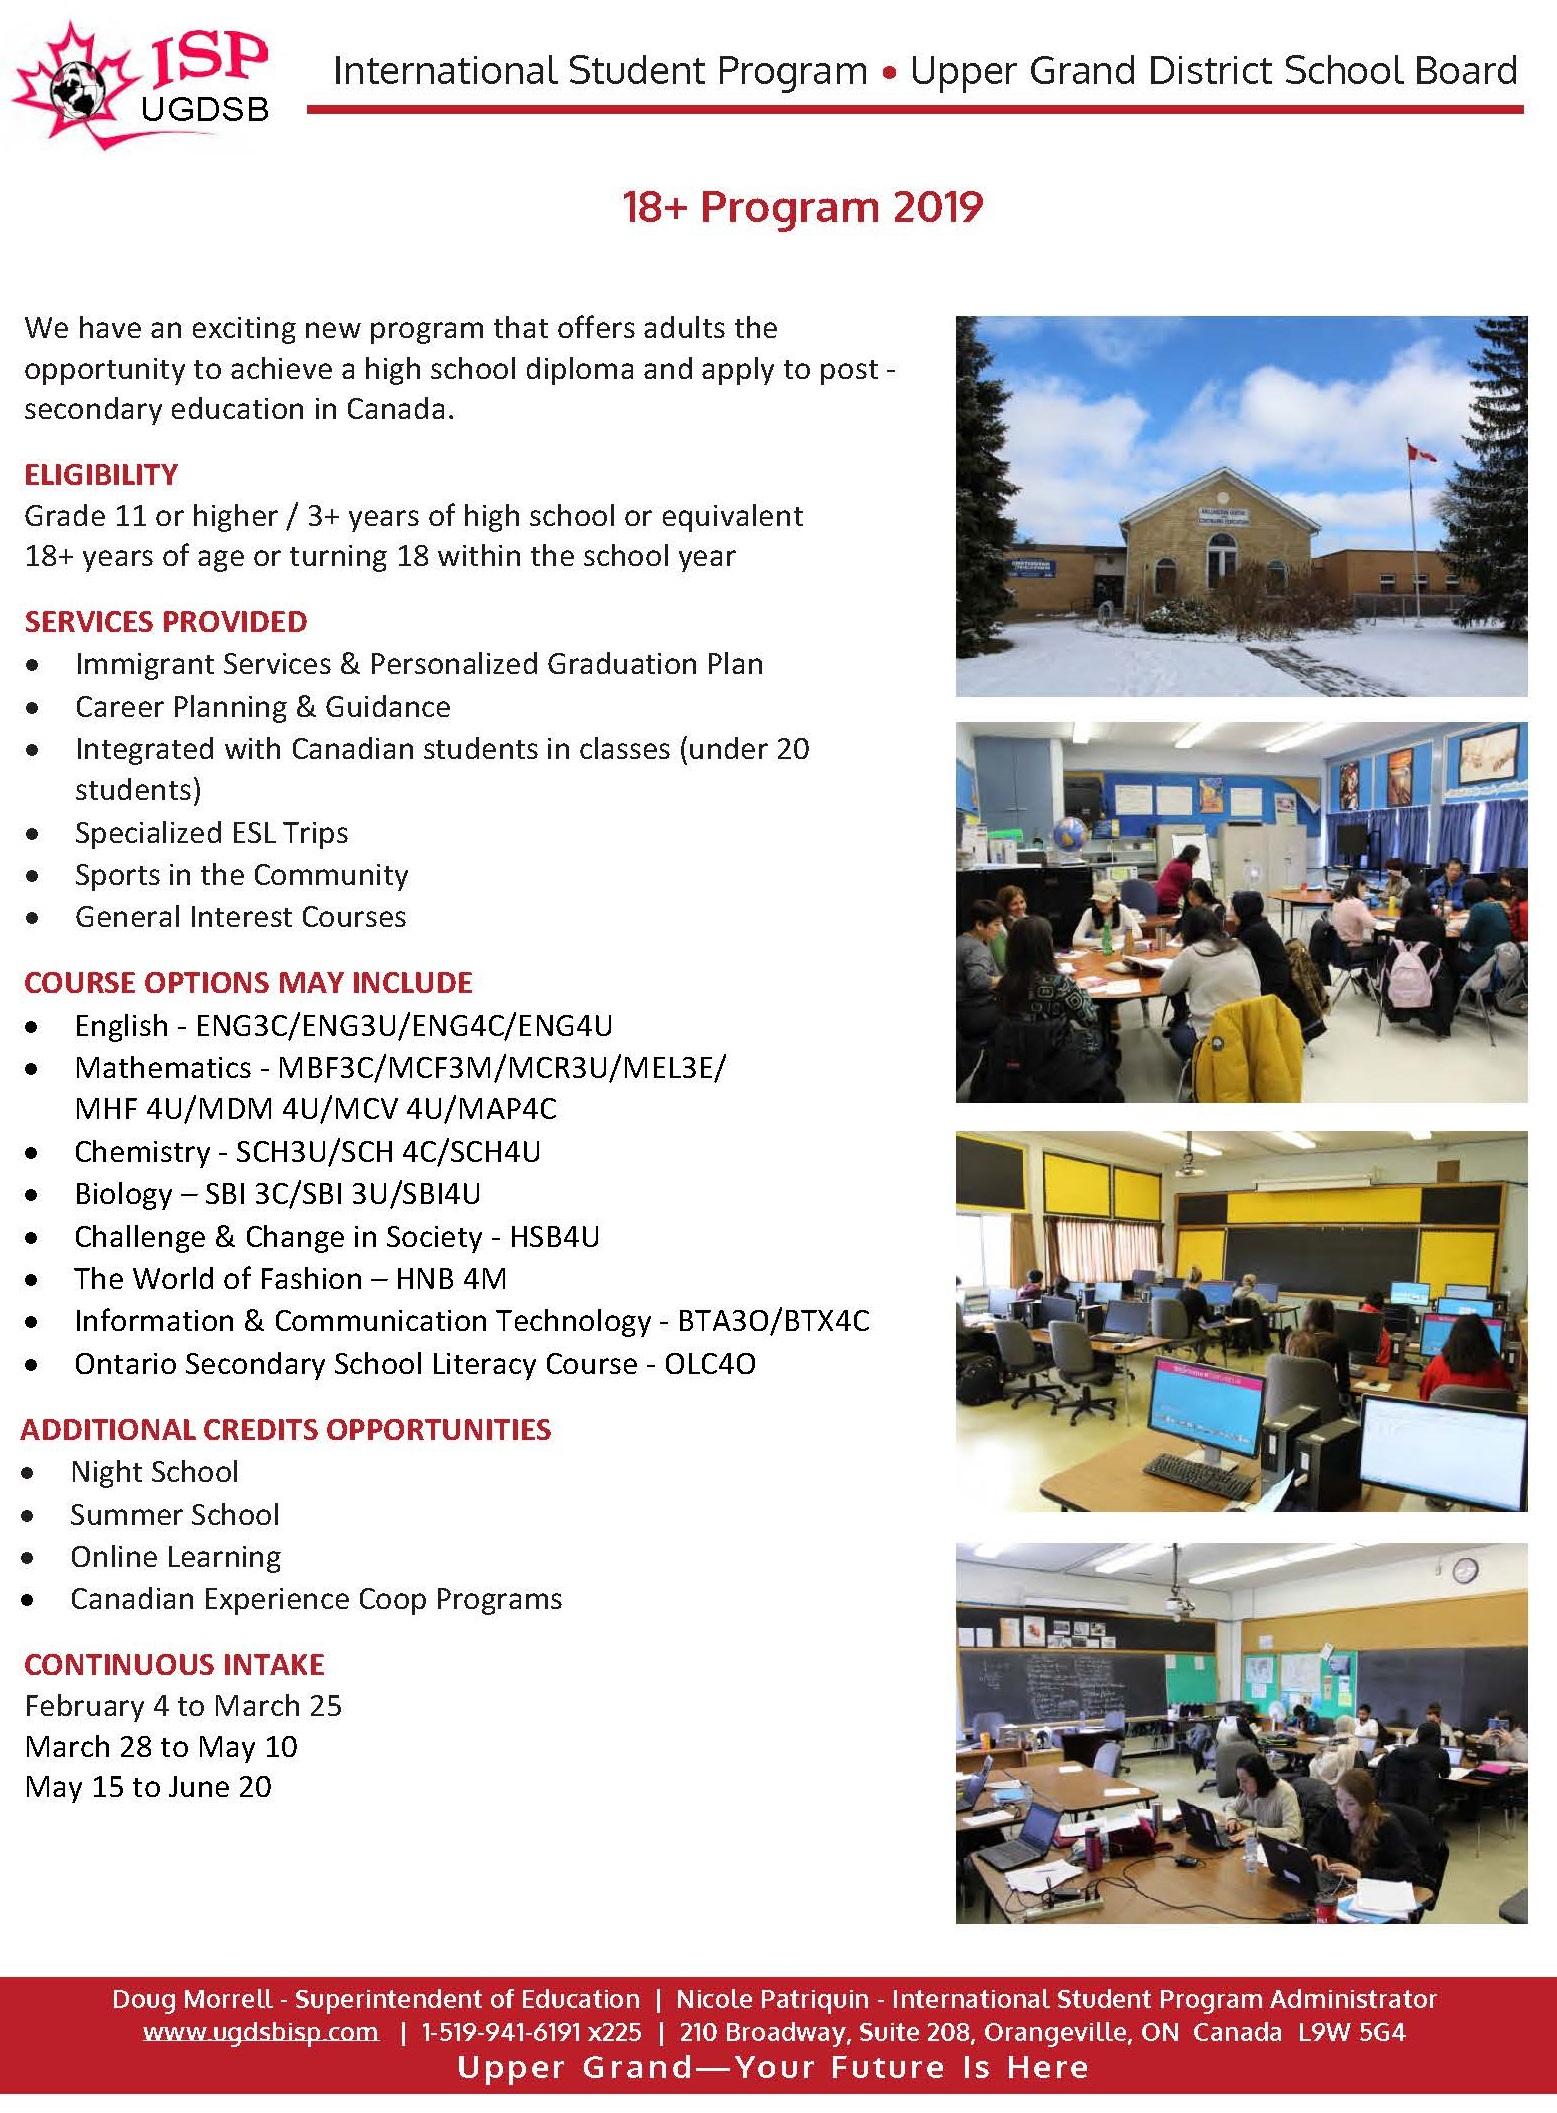 UGDSB ISP 18+ Program 2019 - Upper Grand - International Student Program